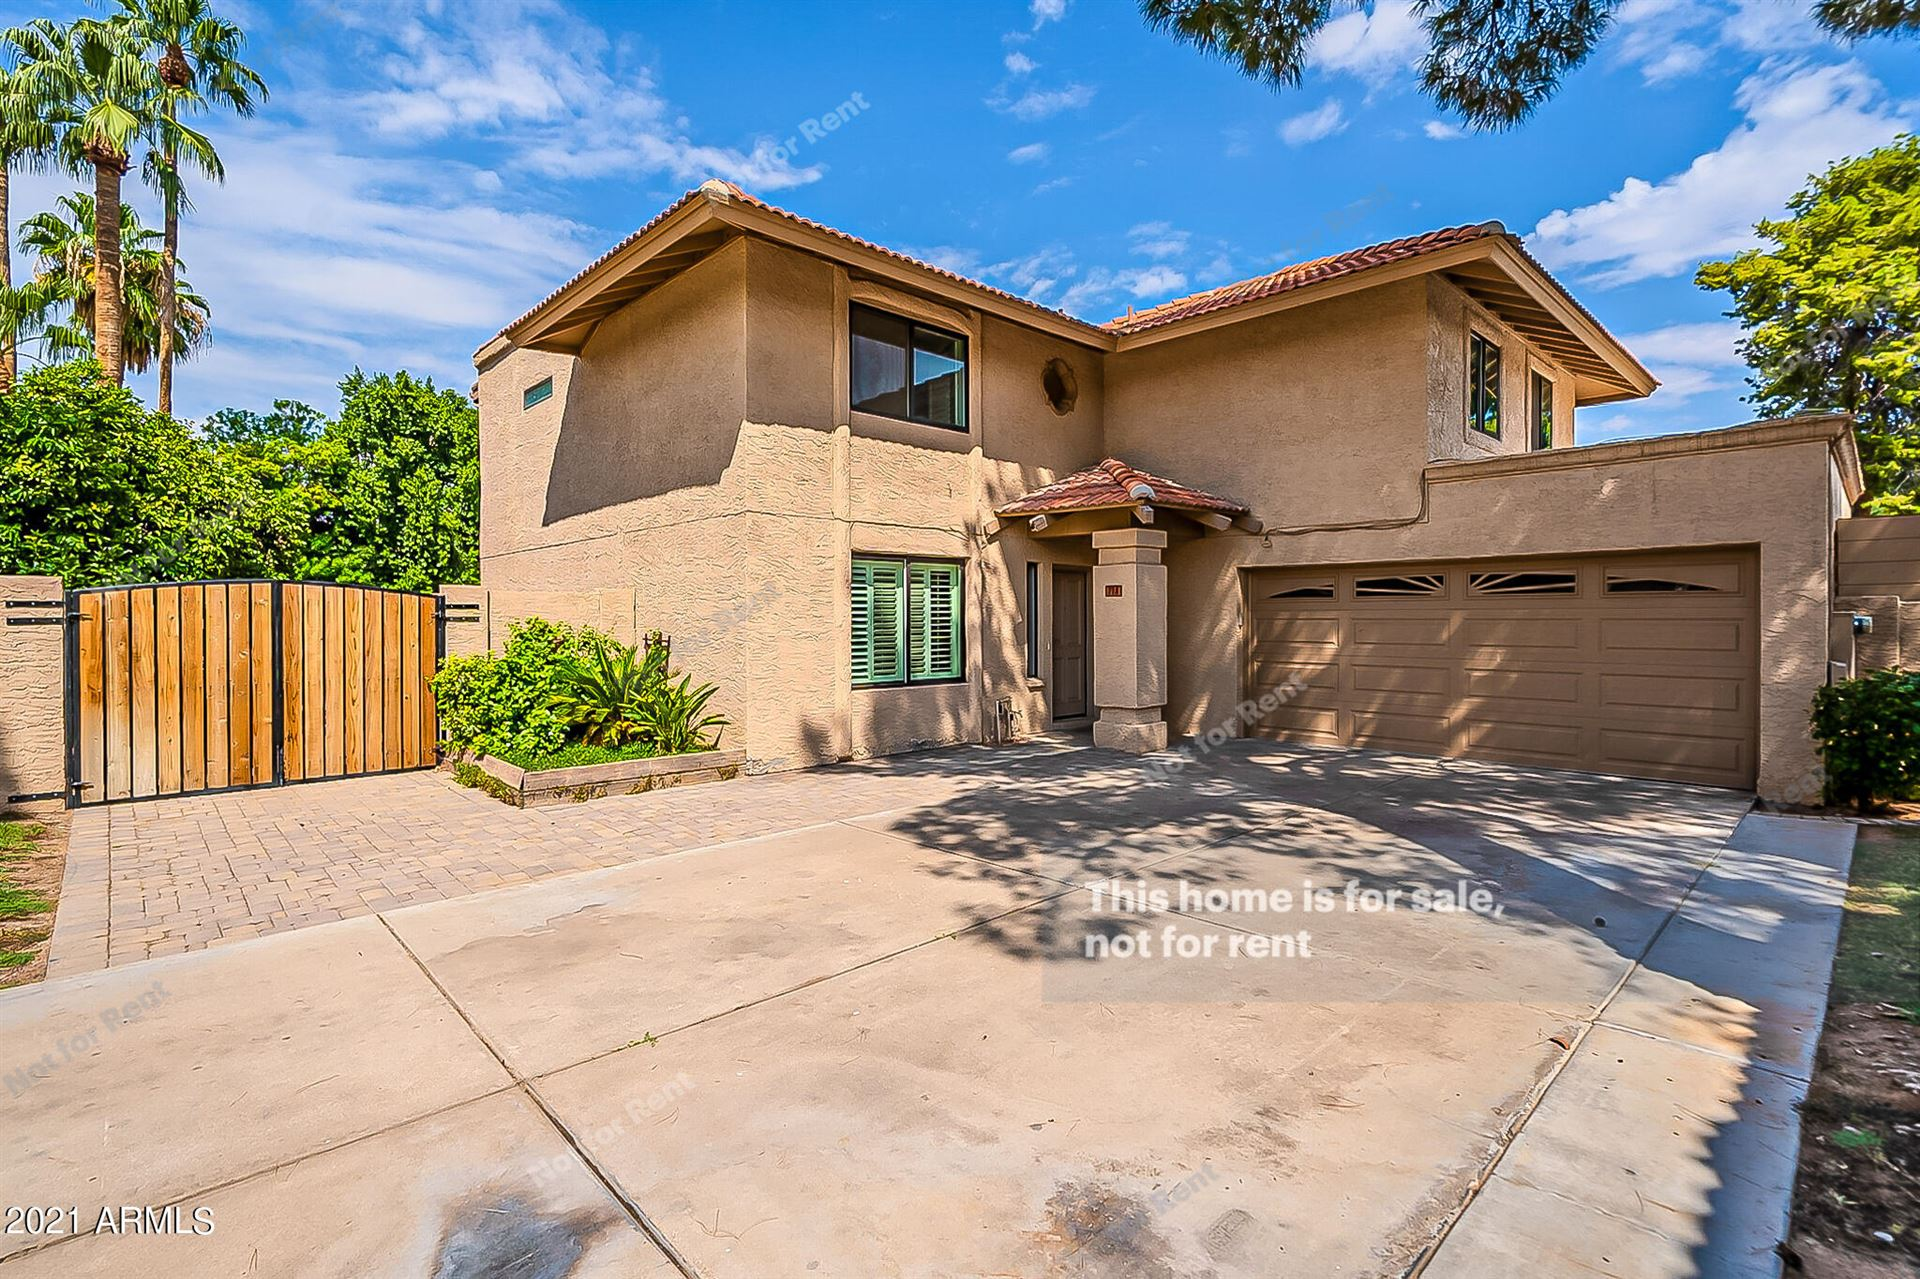 Photo of 713 N LARKSPUR Street, Gilbert, AZ 85234 (MLS # 6296350)